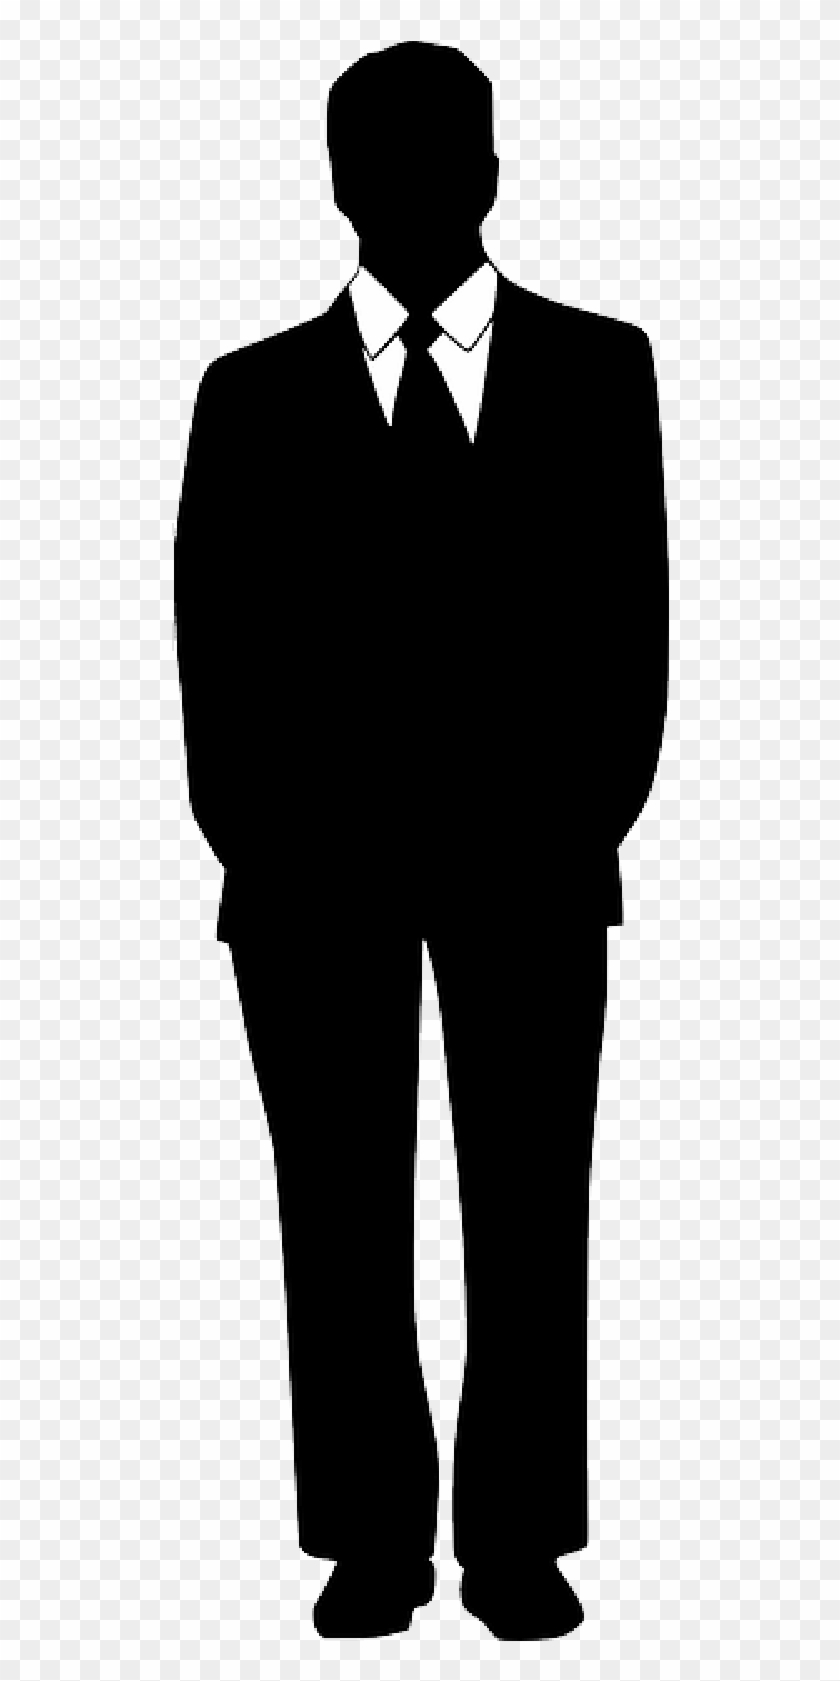 Business Suit Cliparts - Man In Suit Silhouette #557638